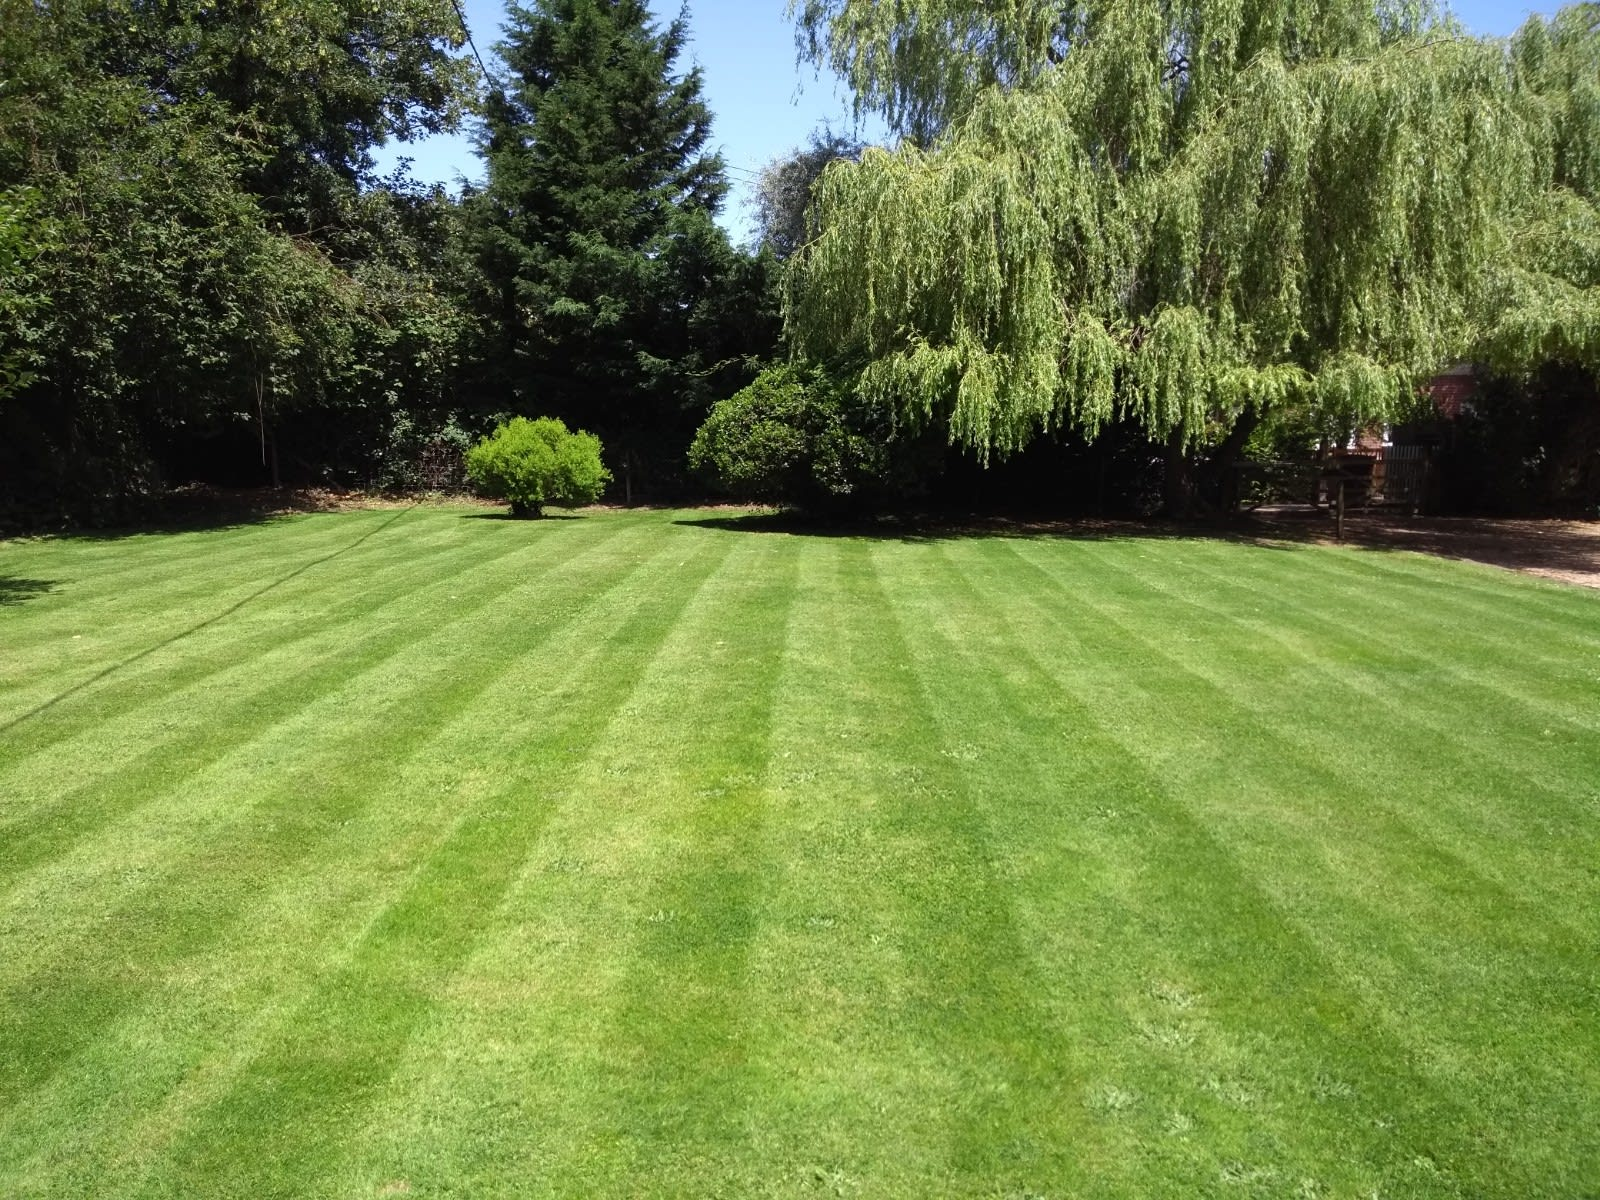 Ed's gardening business stripy summer lawn